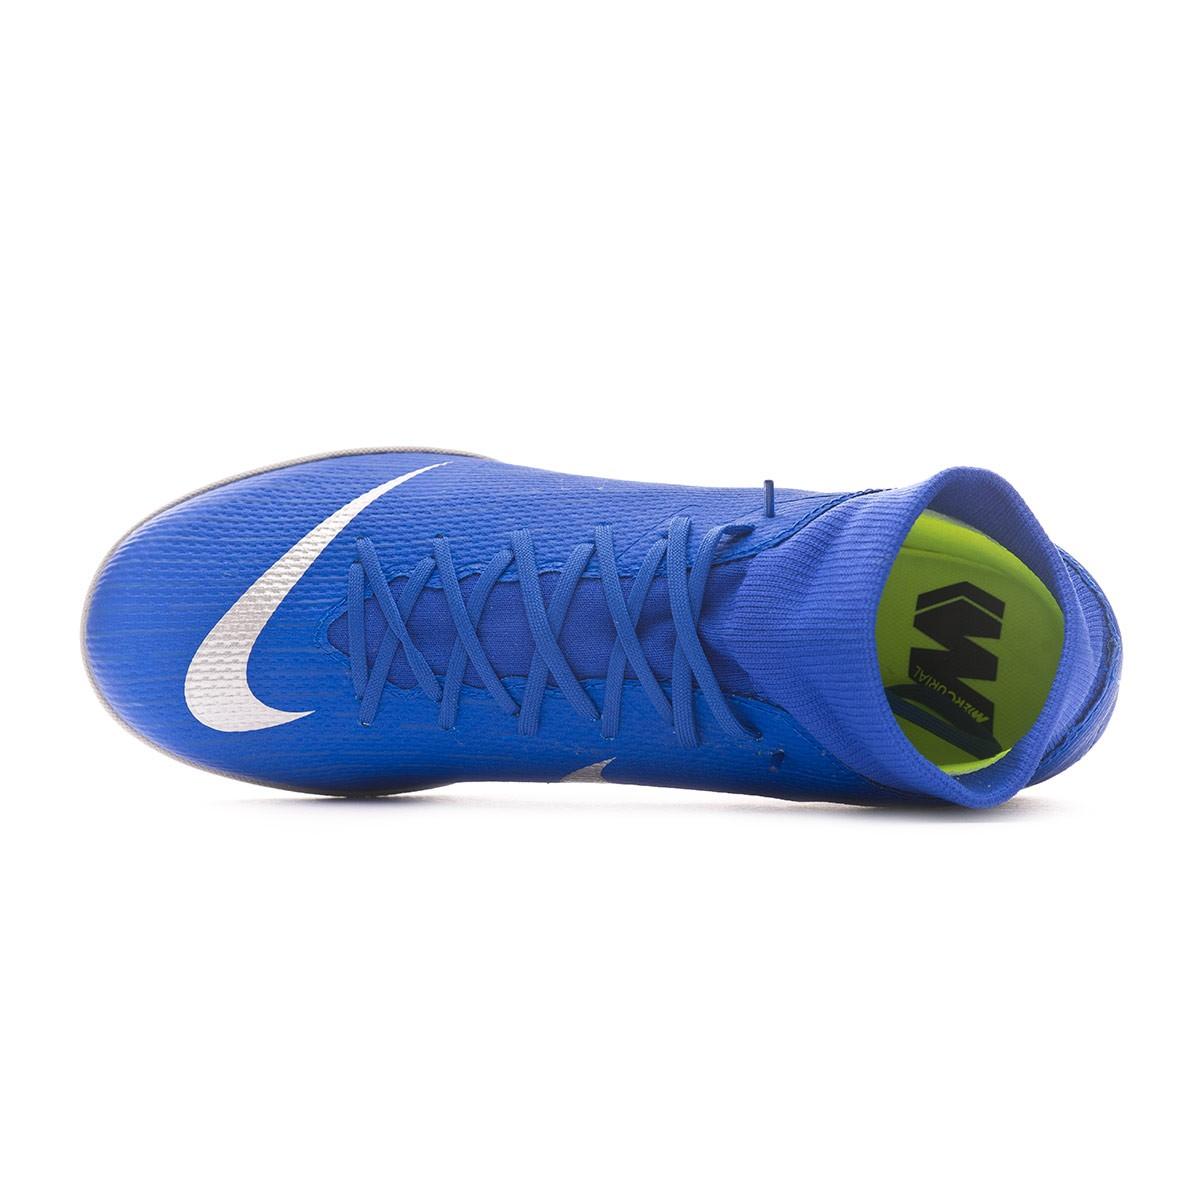 daa4225855fa Futsal Boot Nike Mercurial SuperflyX VI Academy IC Racer blue-Metallic  silver-Black-Volt - Football store Fútbol Emotion